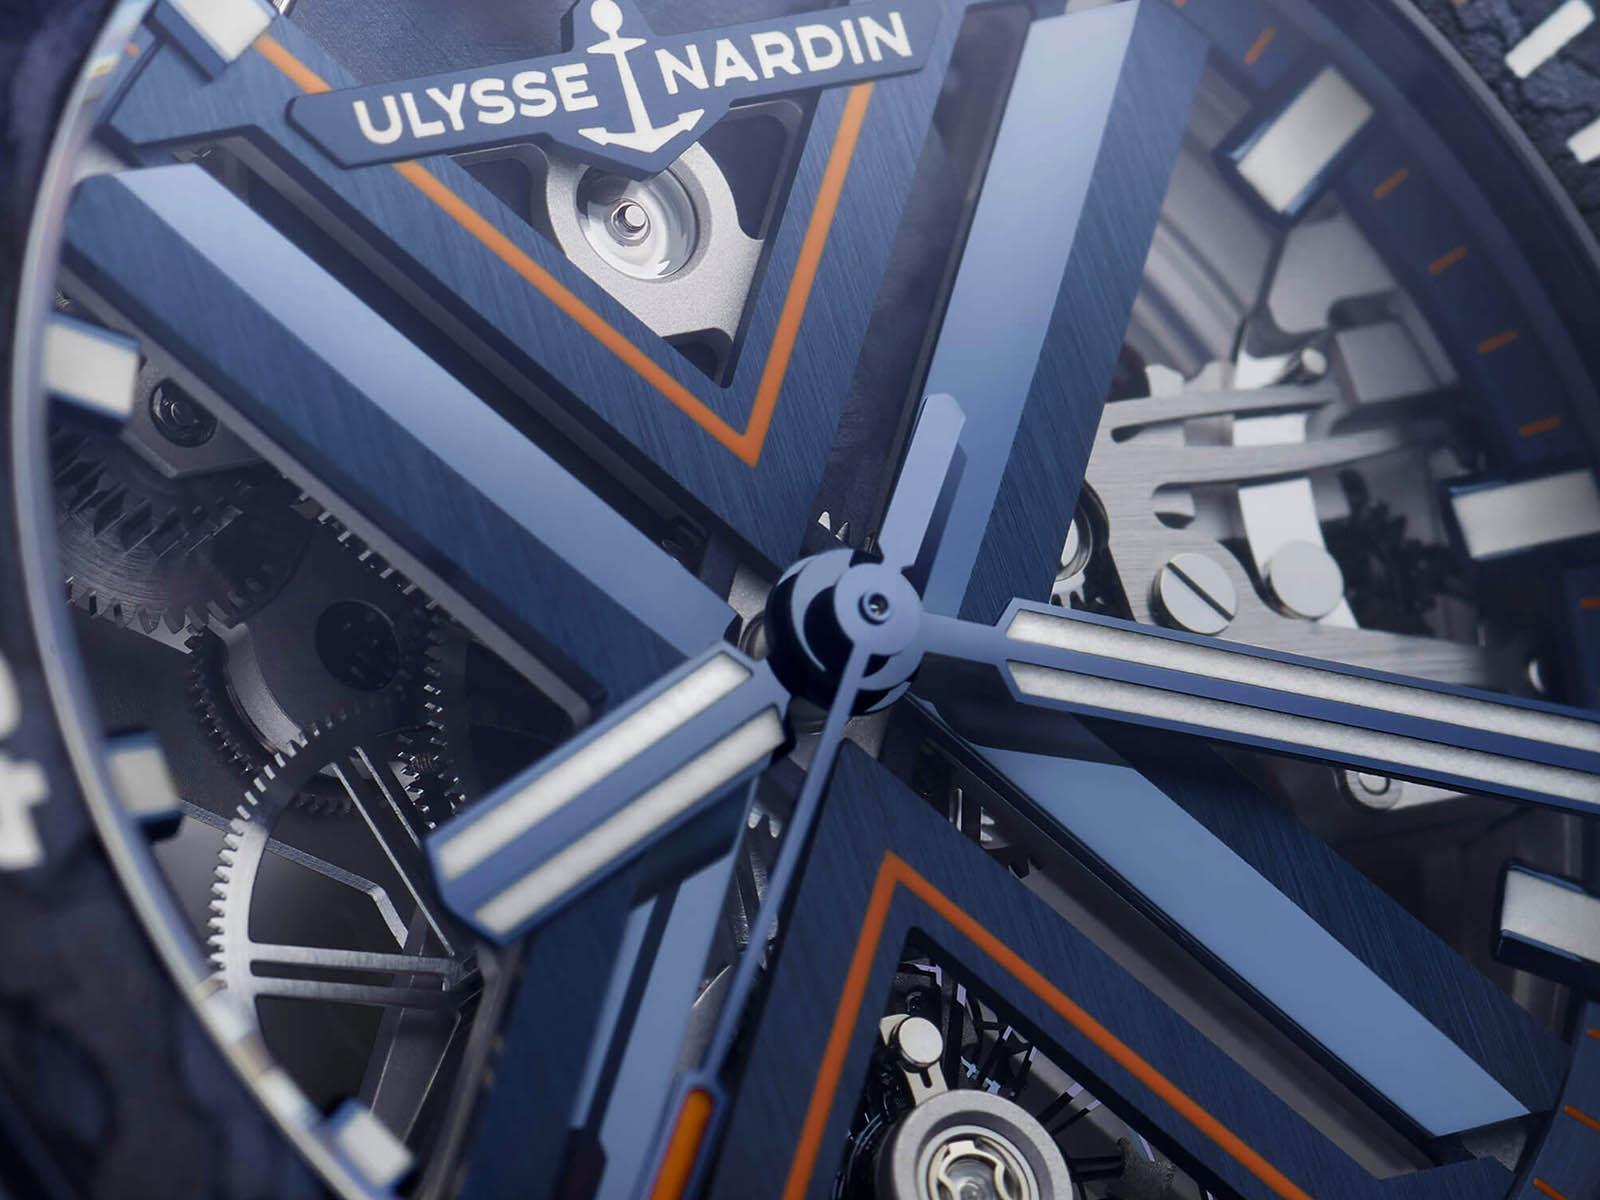 ulysse-nardin-diver-x-skeleton-3.jpg